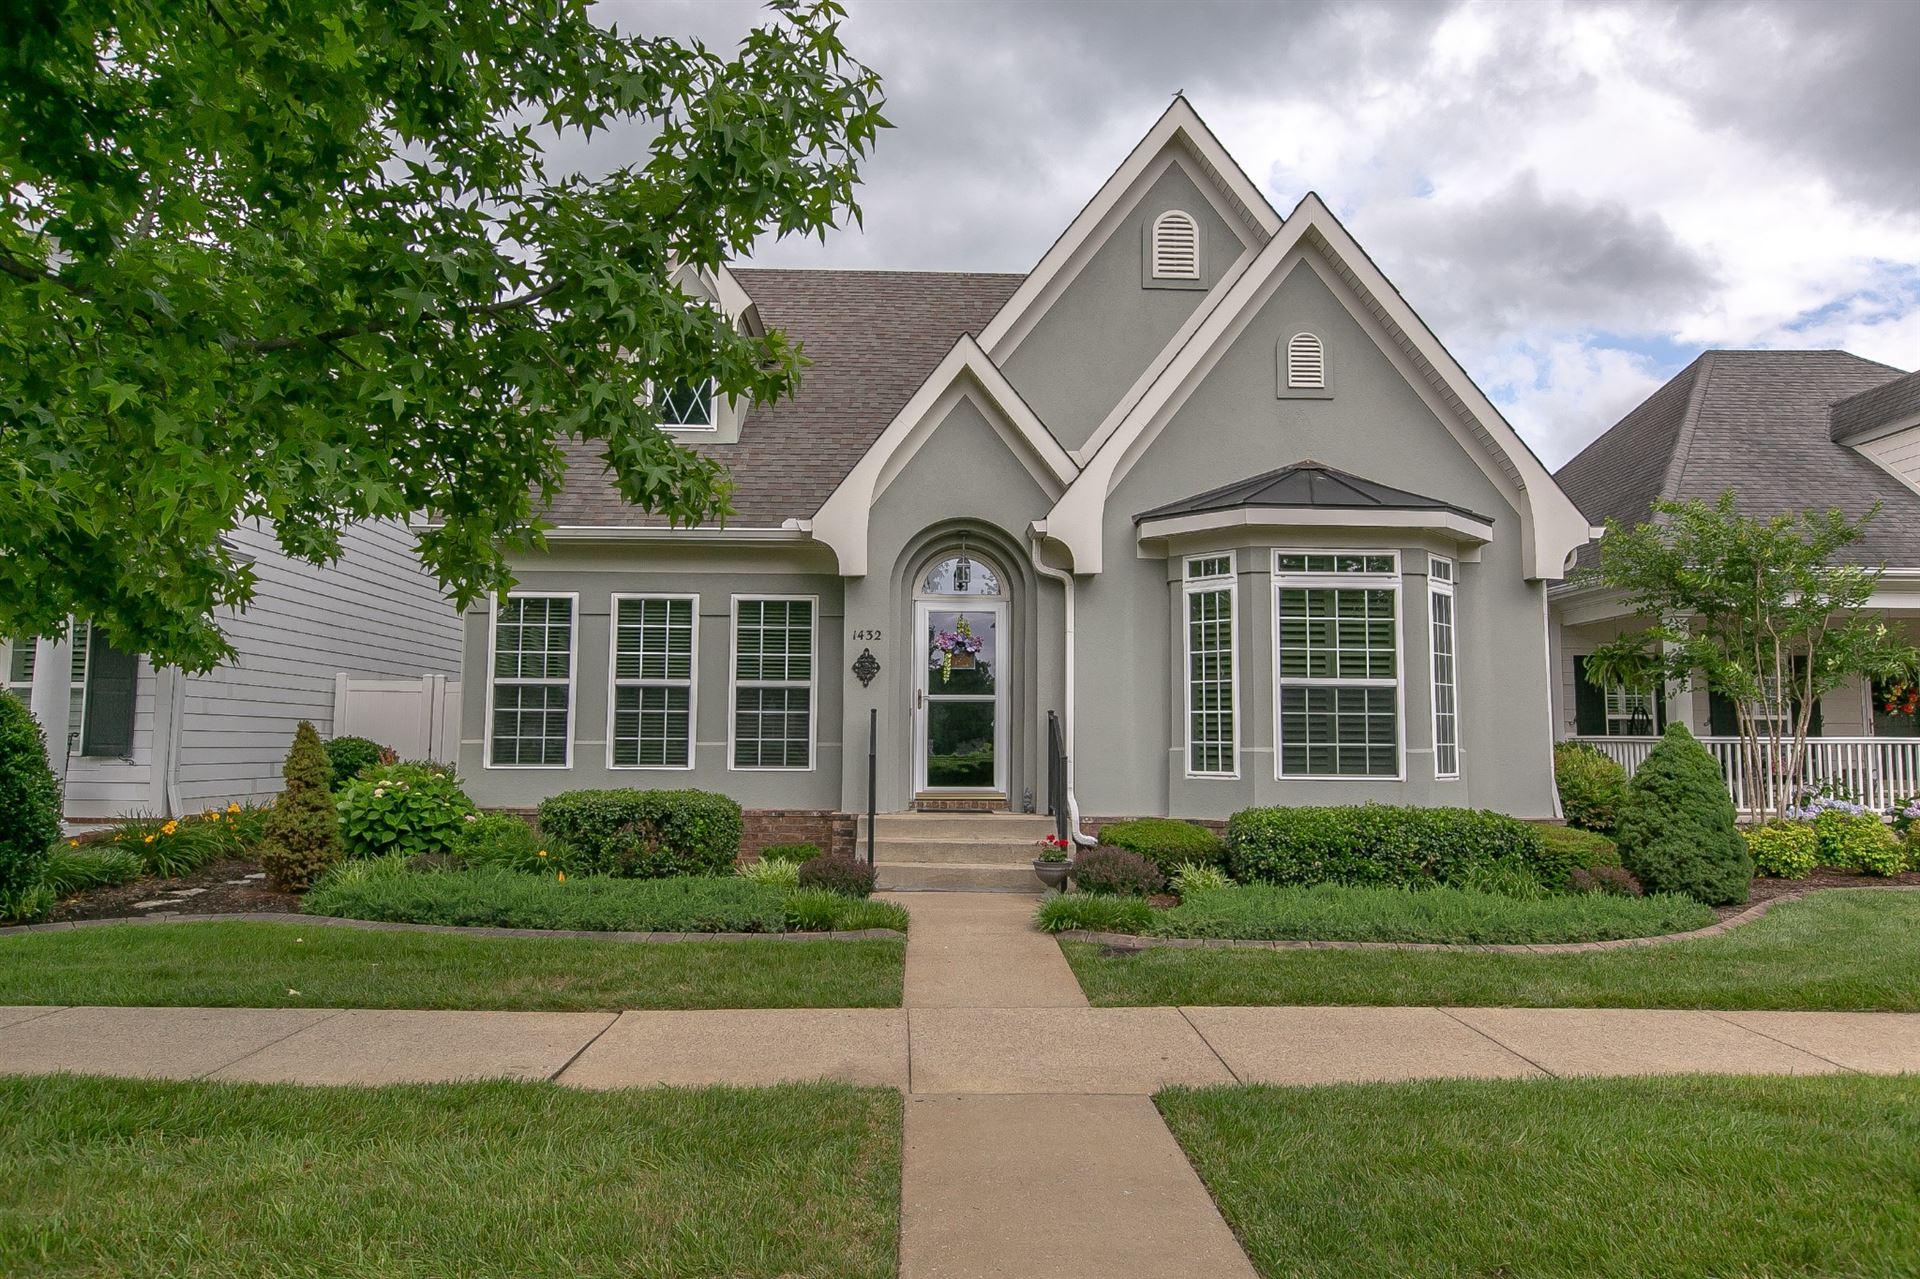 1432 Veranda Circle, Murfreesboro, TN 37130 - MLS#: 2260894